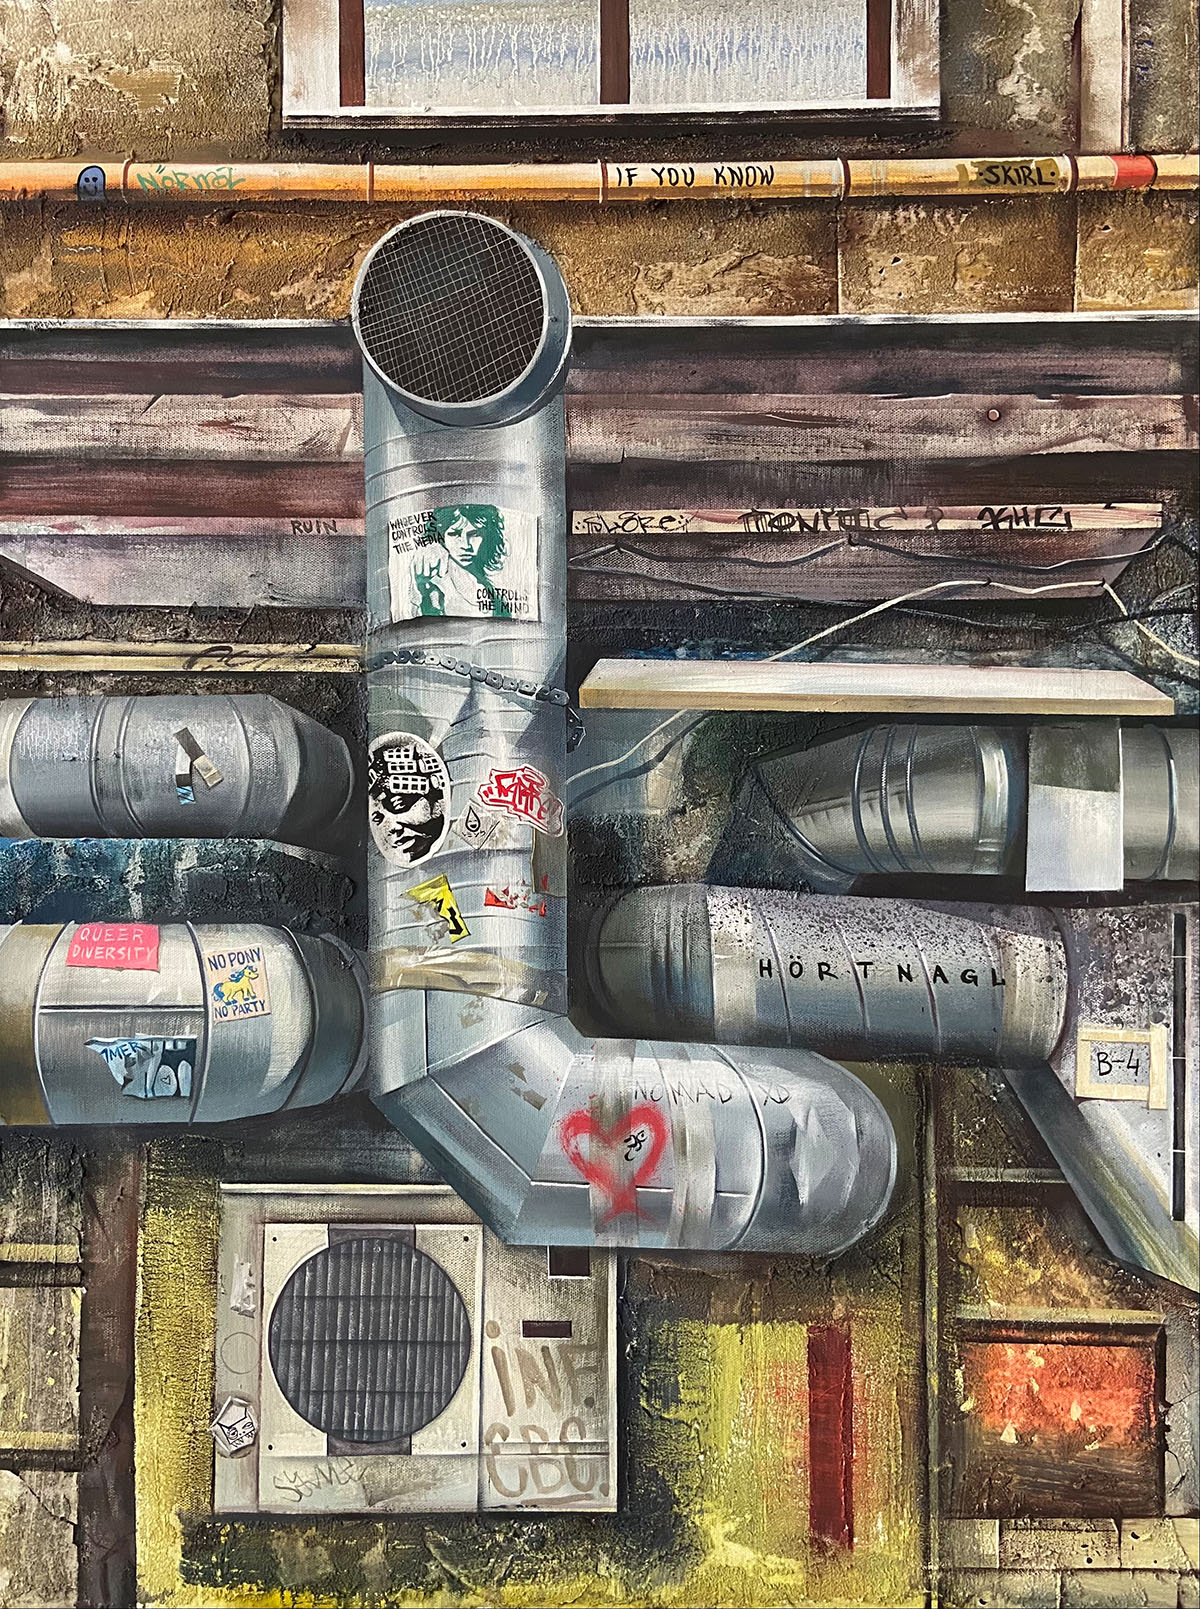 Communication series, acrylic on canvas, 80x60cm, 2021